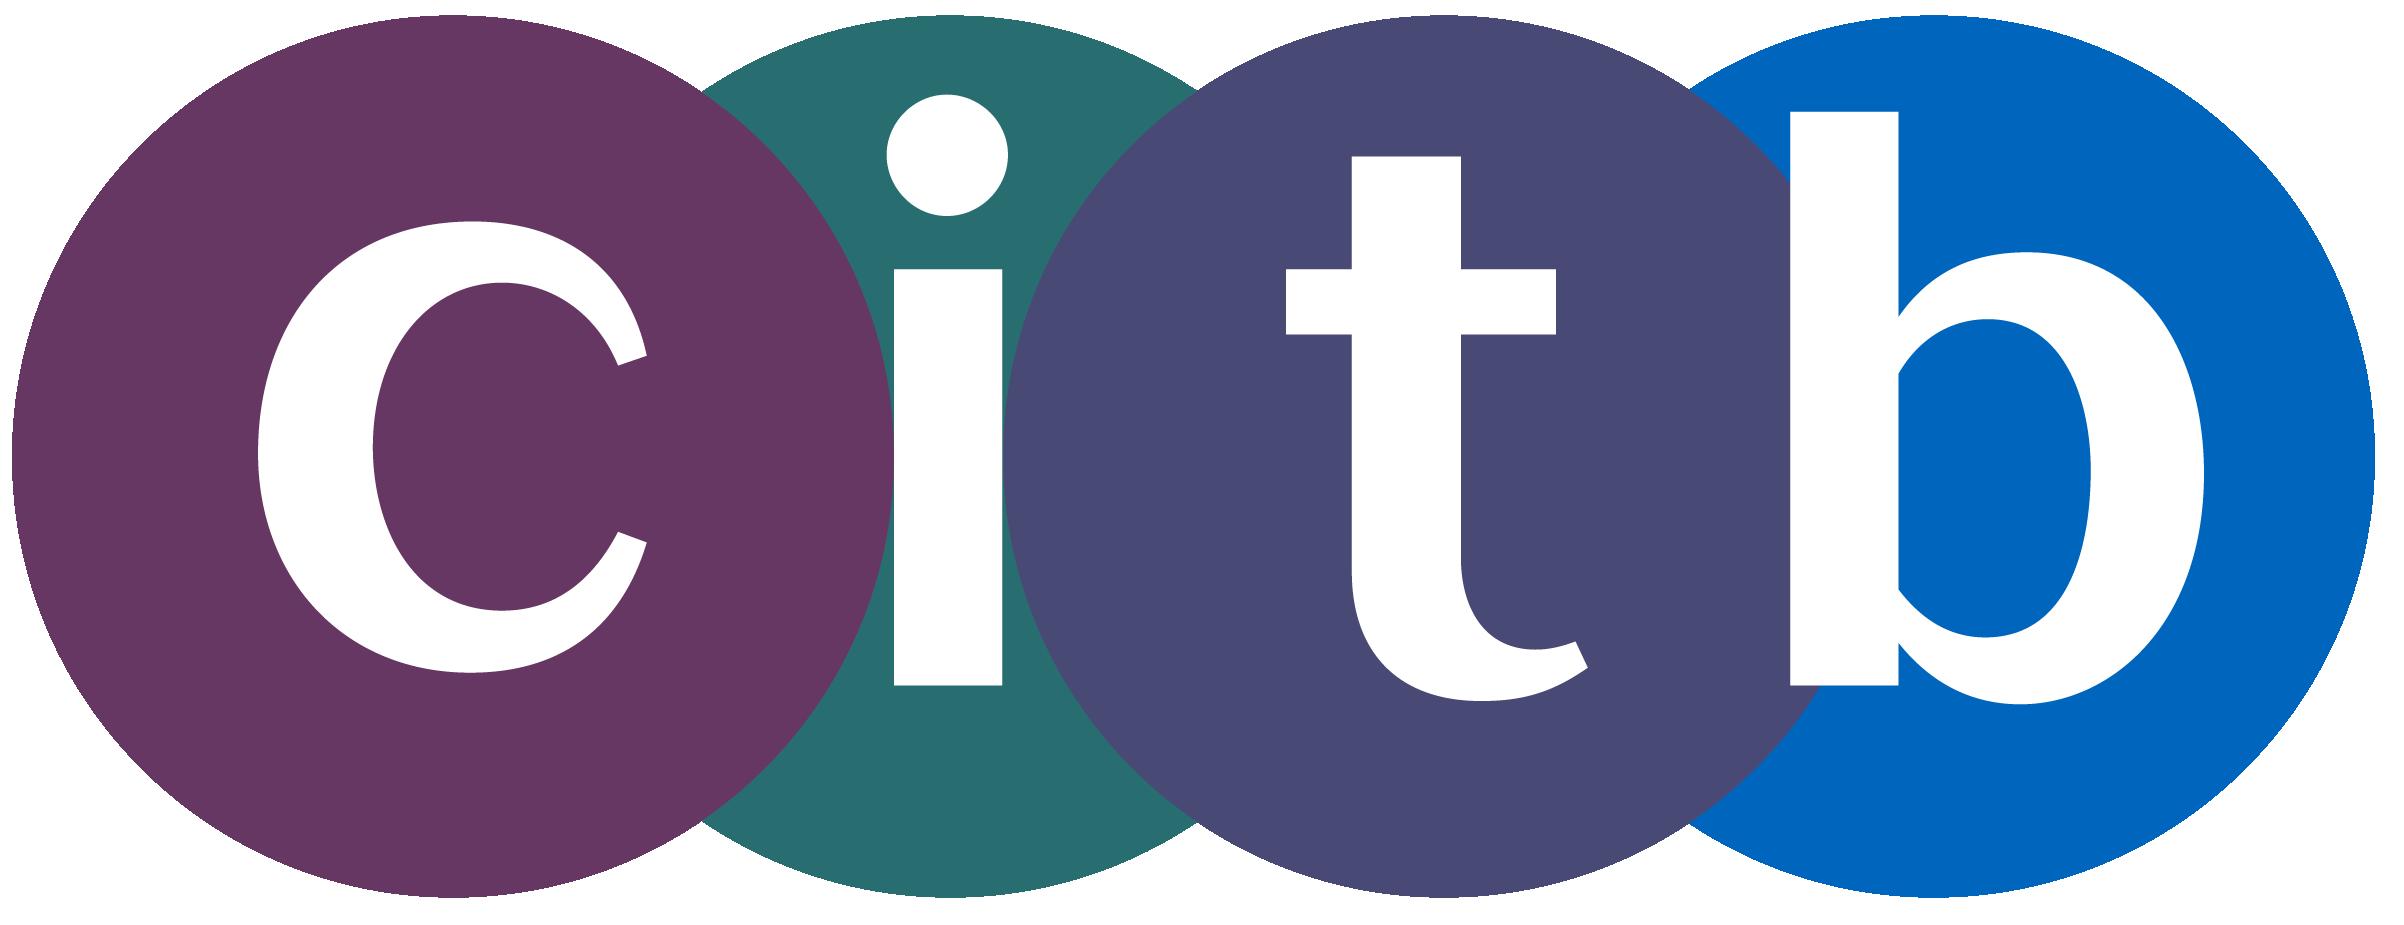 CITB courses Nati